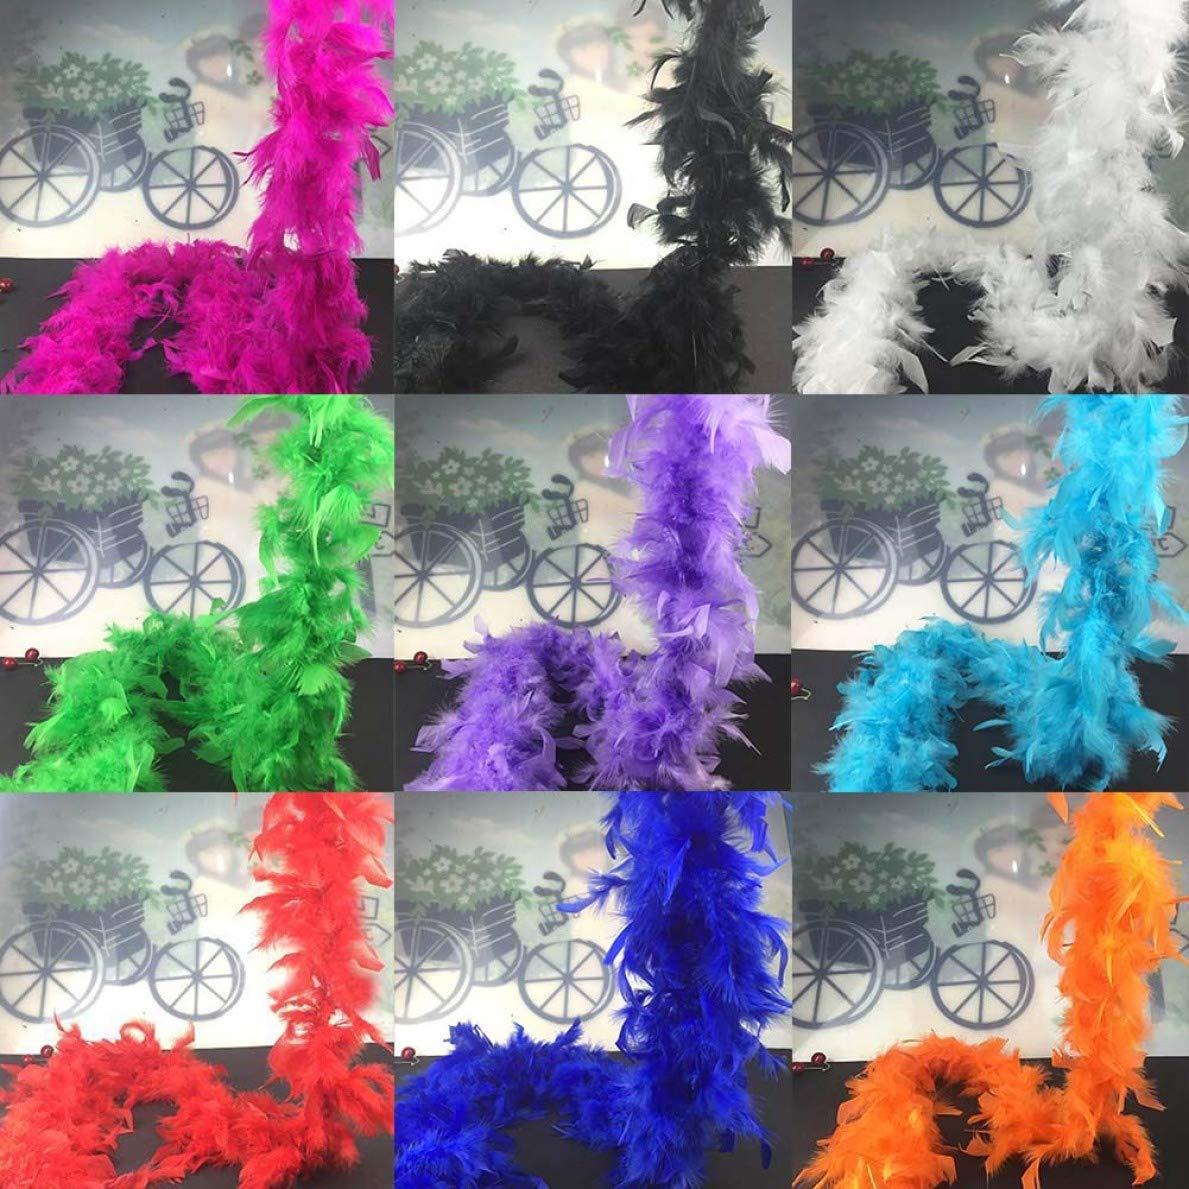 Disfraz Estilo HasiDun 2 m 11 Colores Disfraz 11 Tiras de Boda Tira de Plumas de Boa sin Defectos para Disfraz 2 m Estilo m/ágico para decoraci/ón del hogar Colores de Fiesta